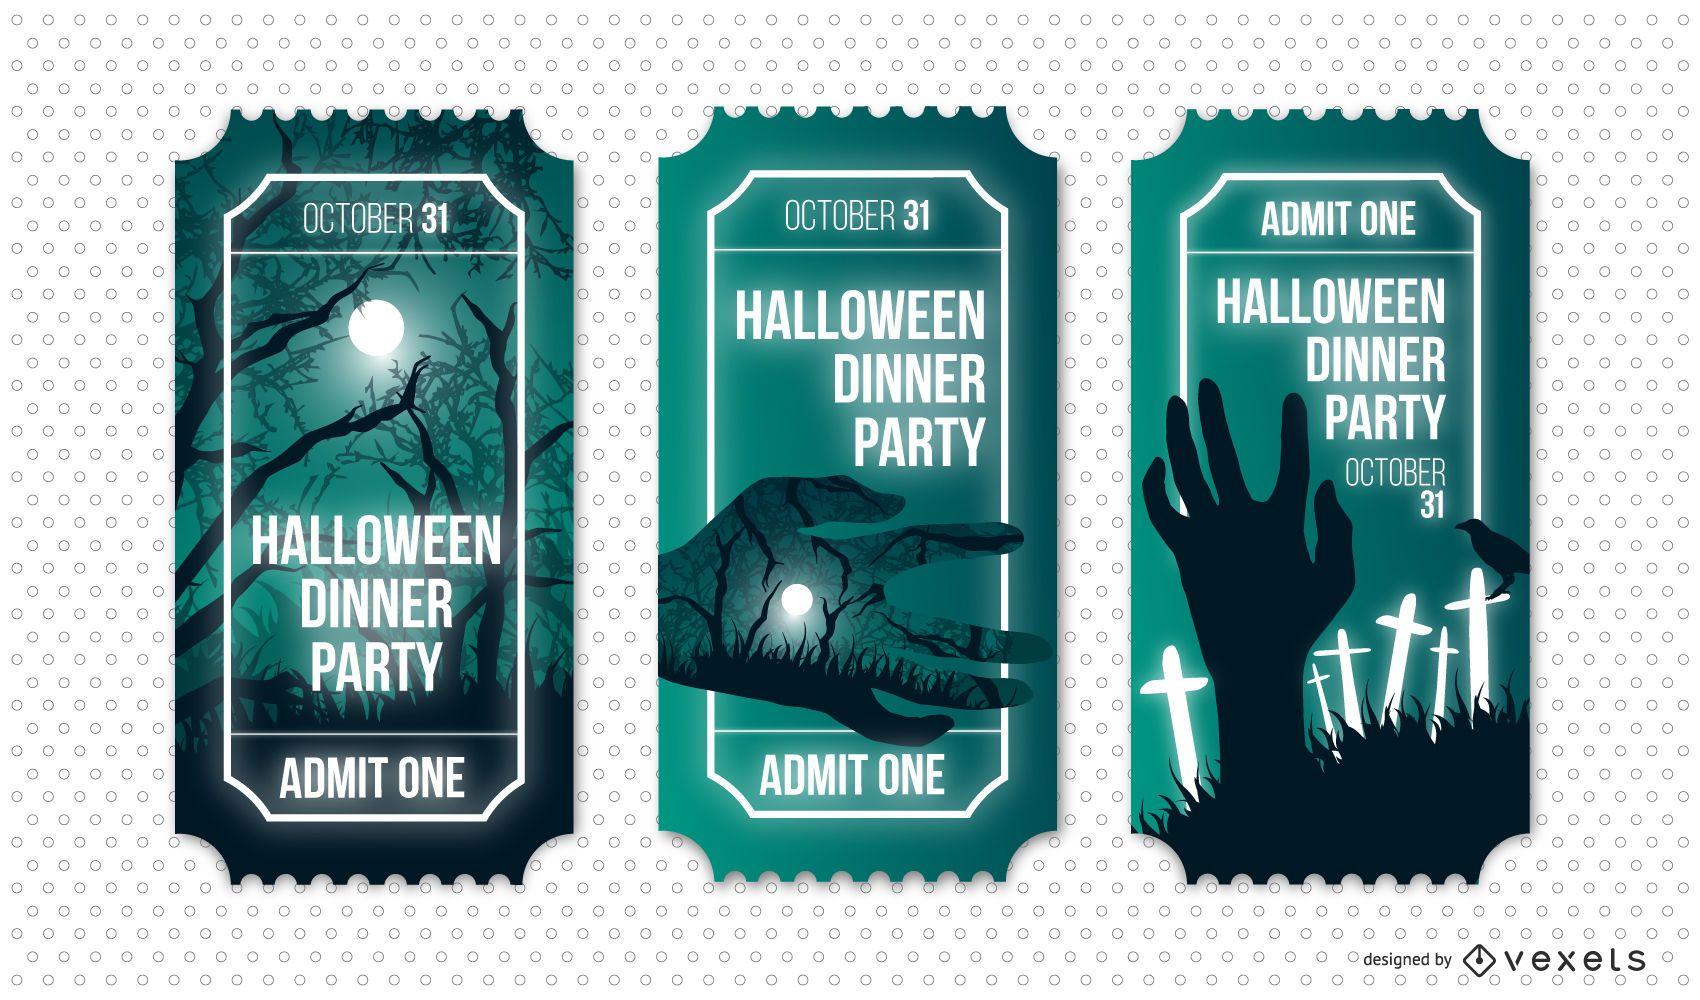 Halloween dinner party ticket set